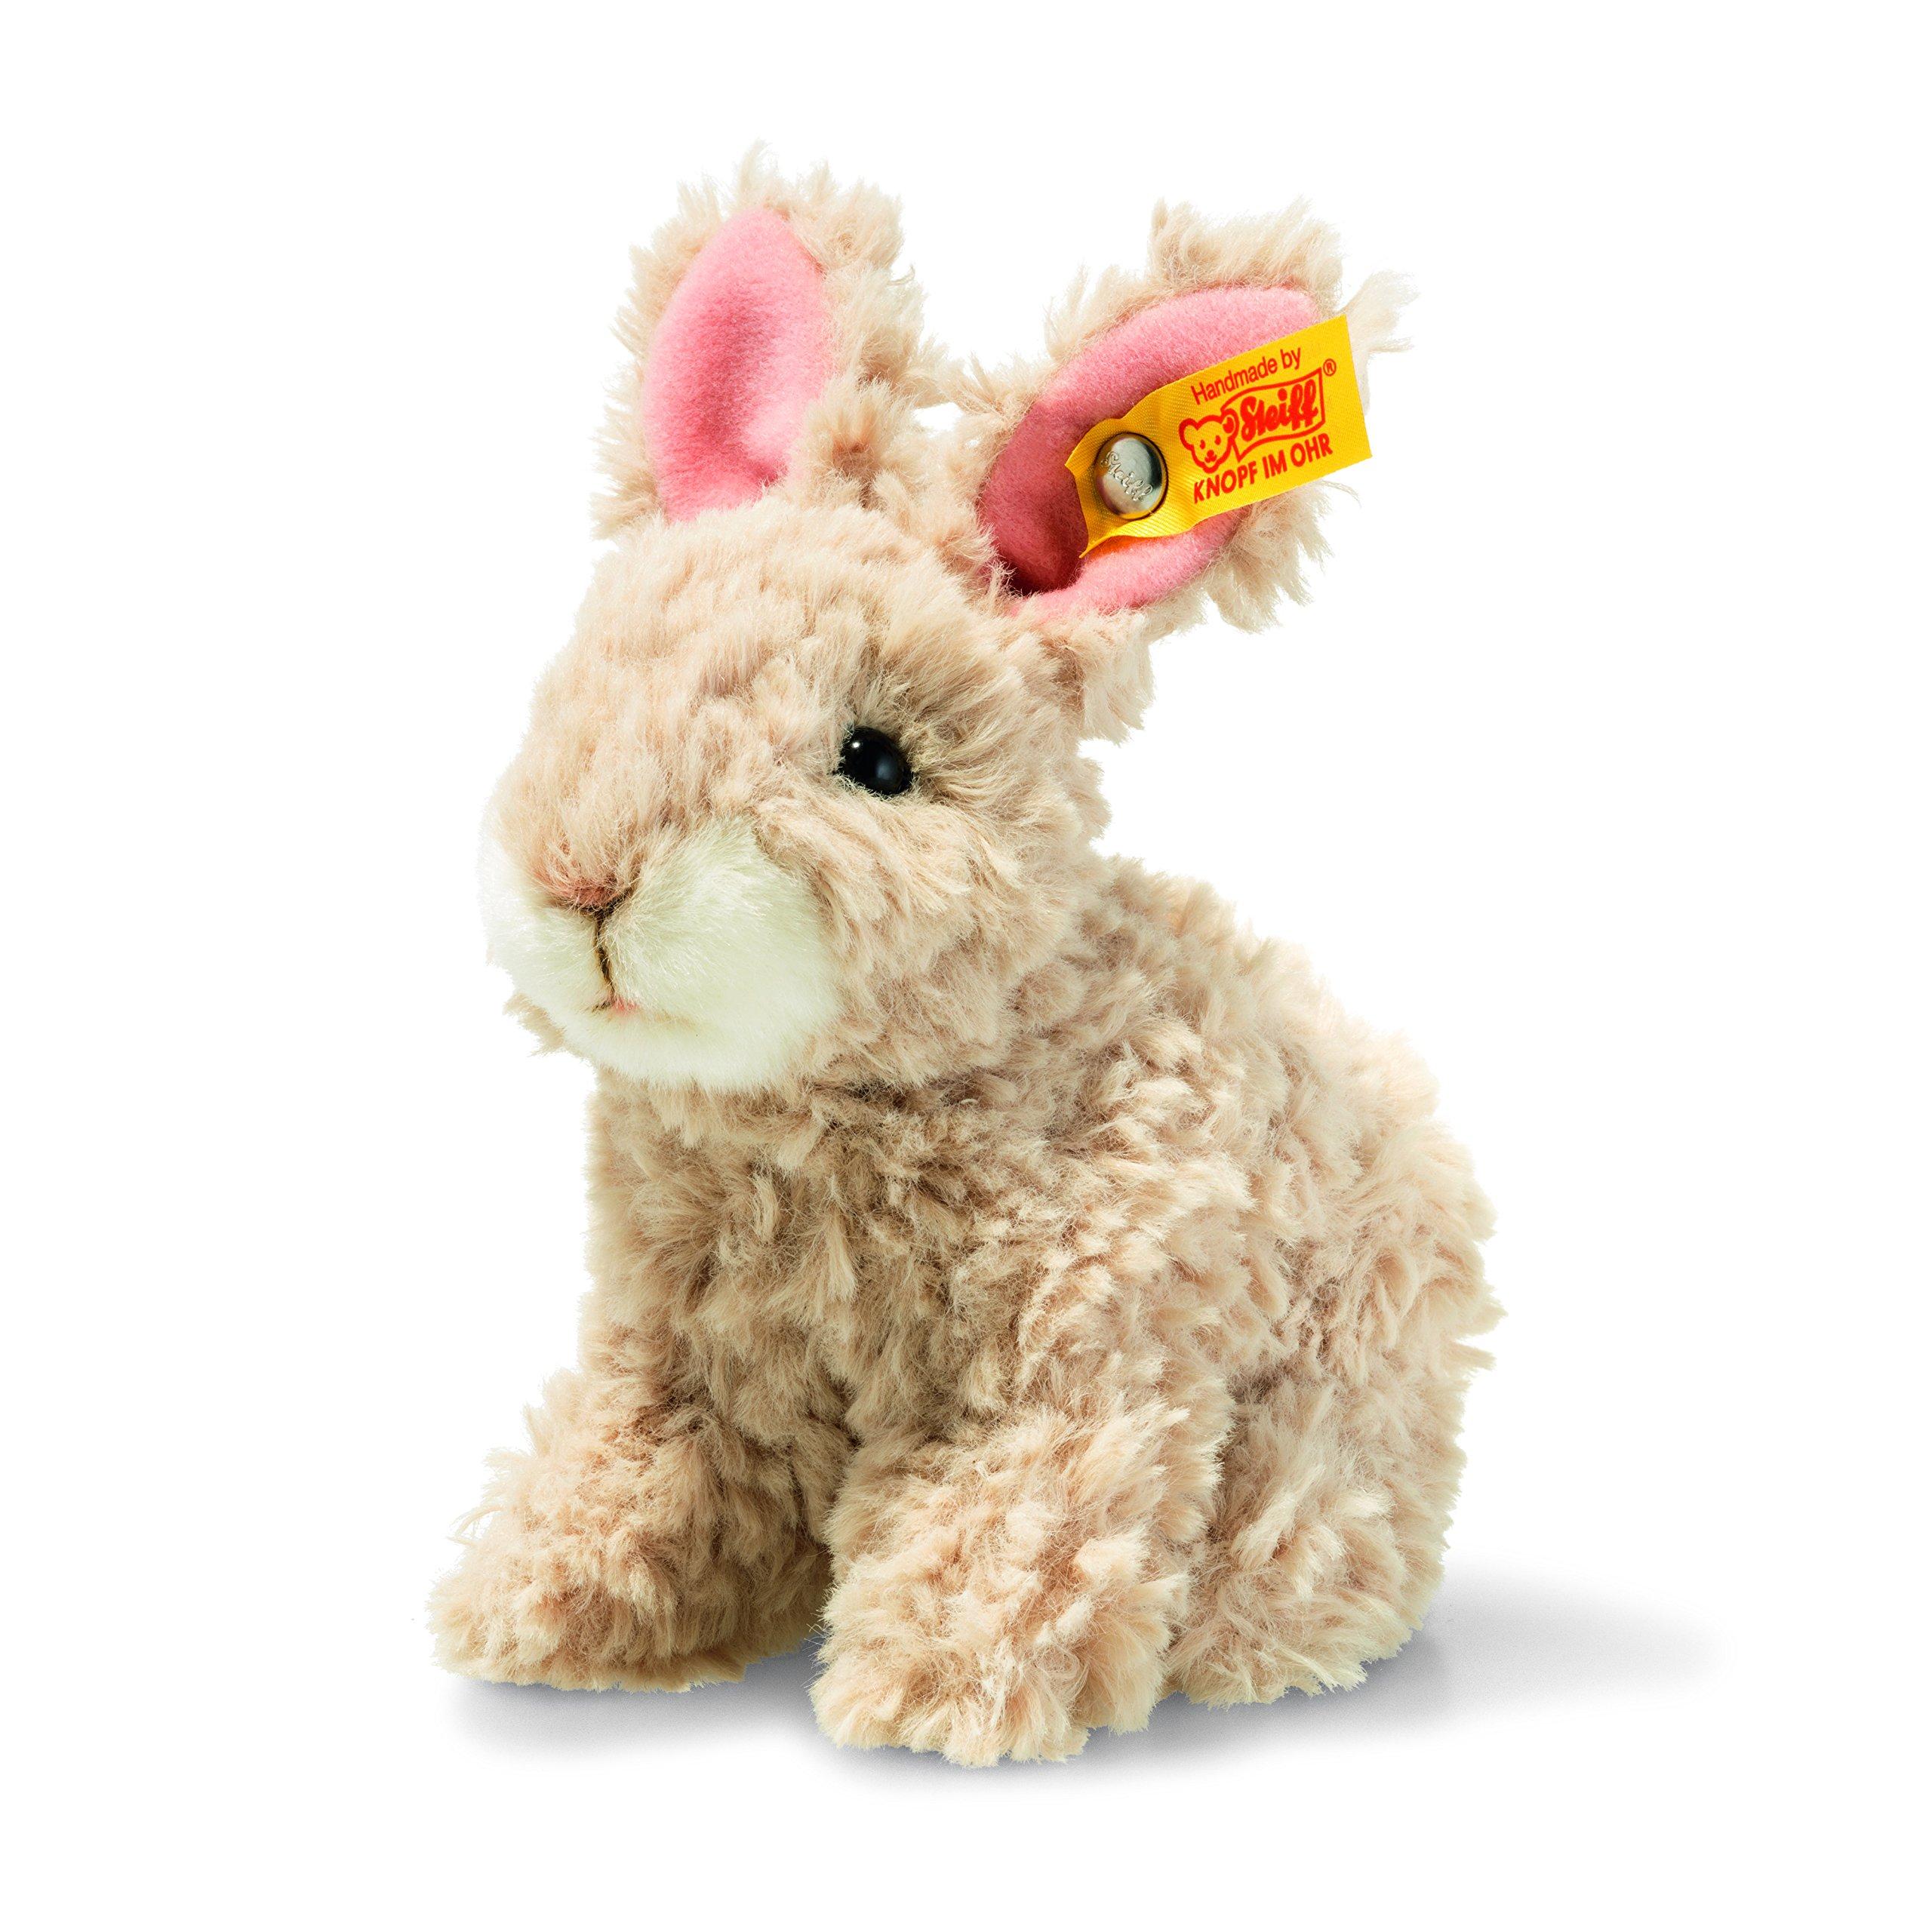 Steiff 080517 Mummel Rabbit Plush Animal Toy, Beige by Steiff